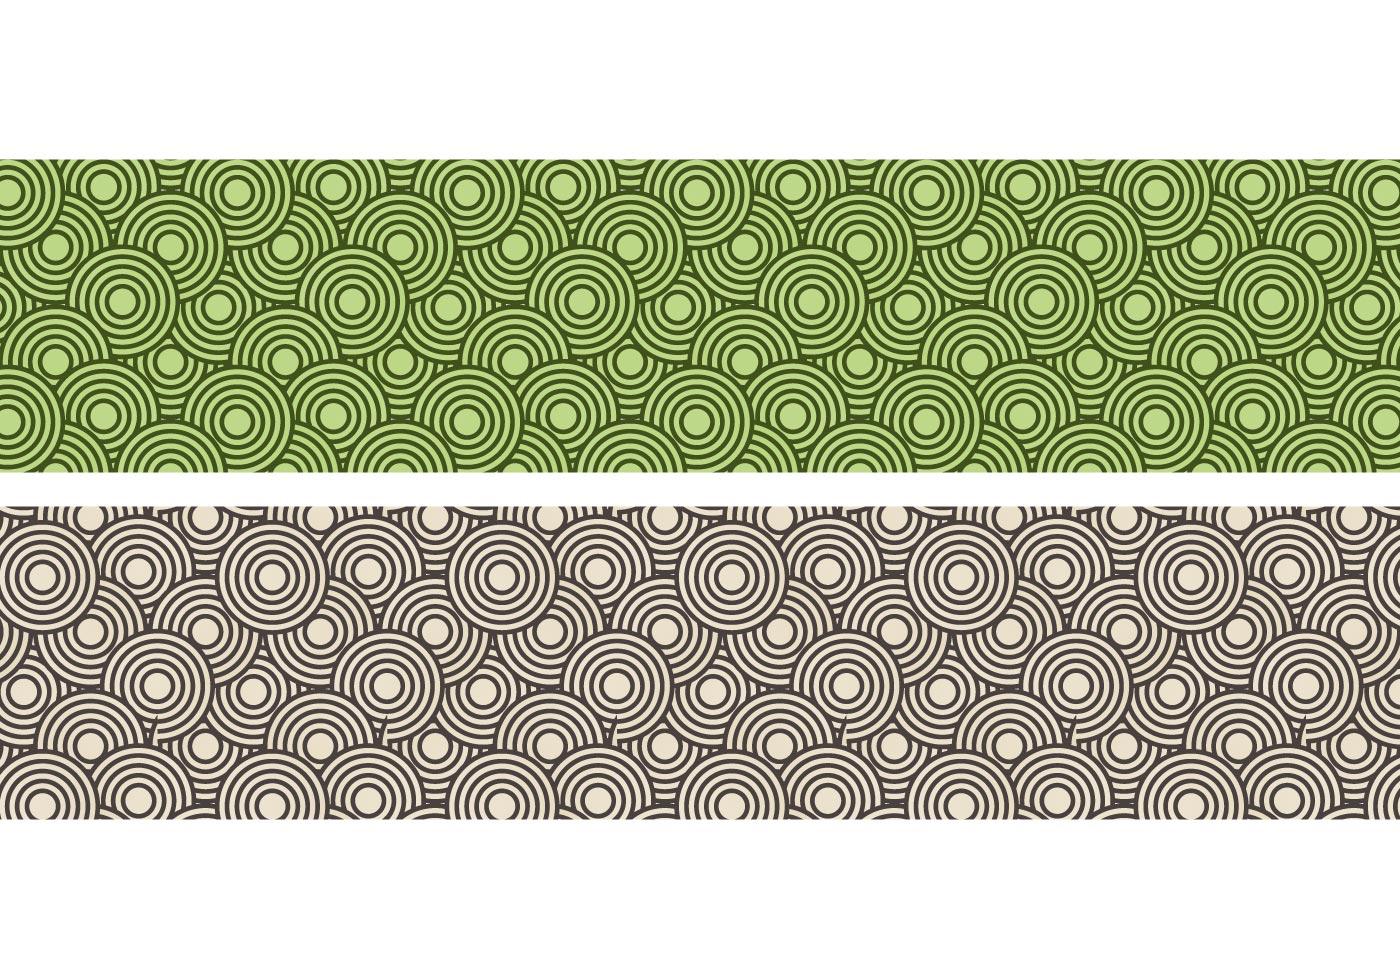 Wallpaper Black Orange Crazy Circles Free Seamless Pattern Download Free Vector